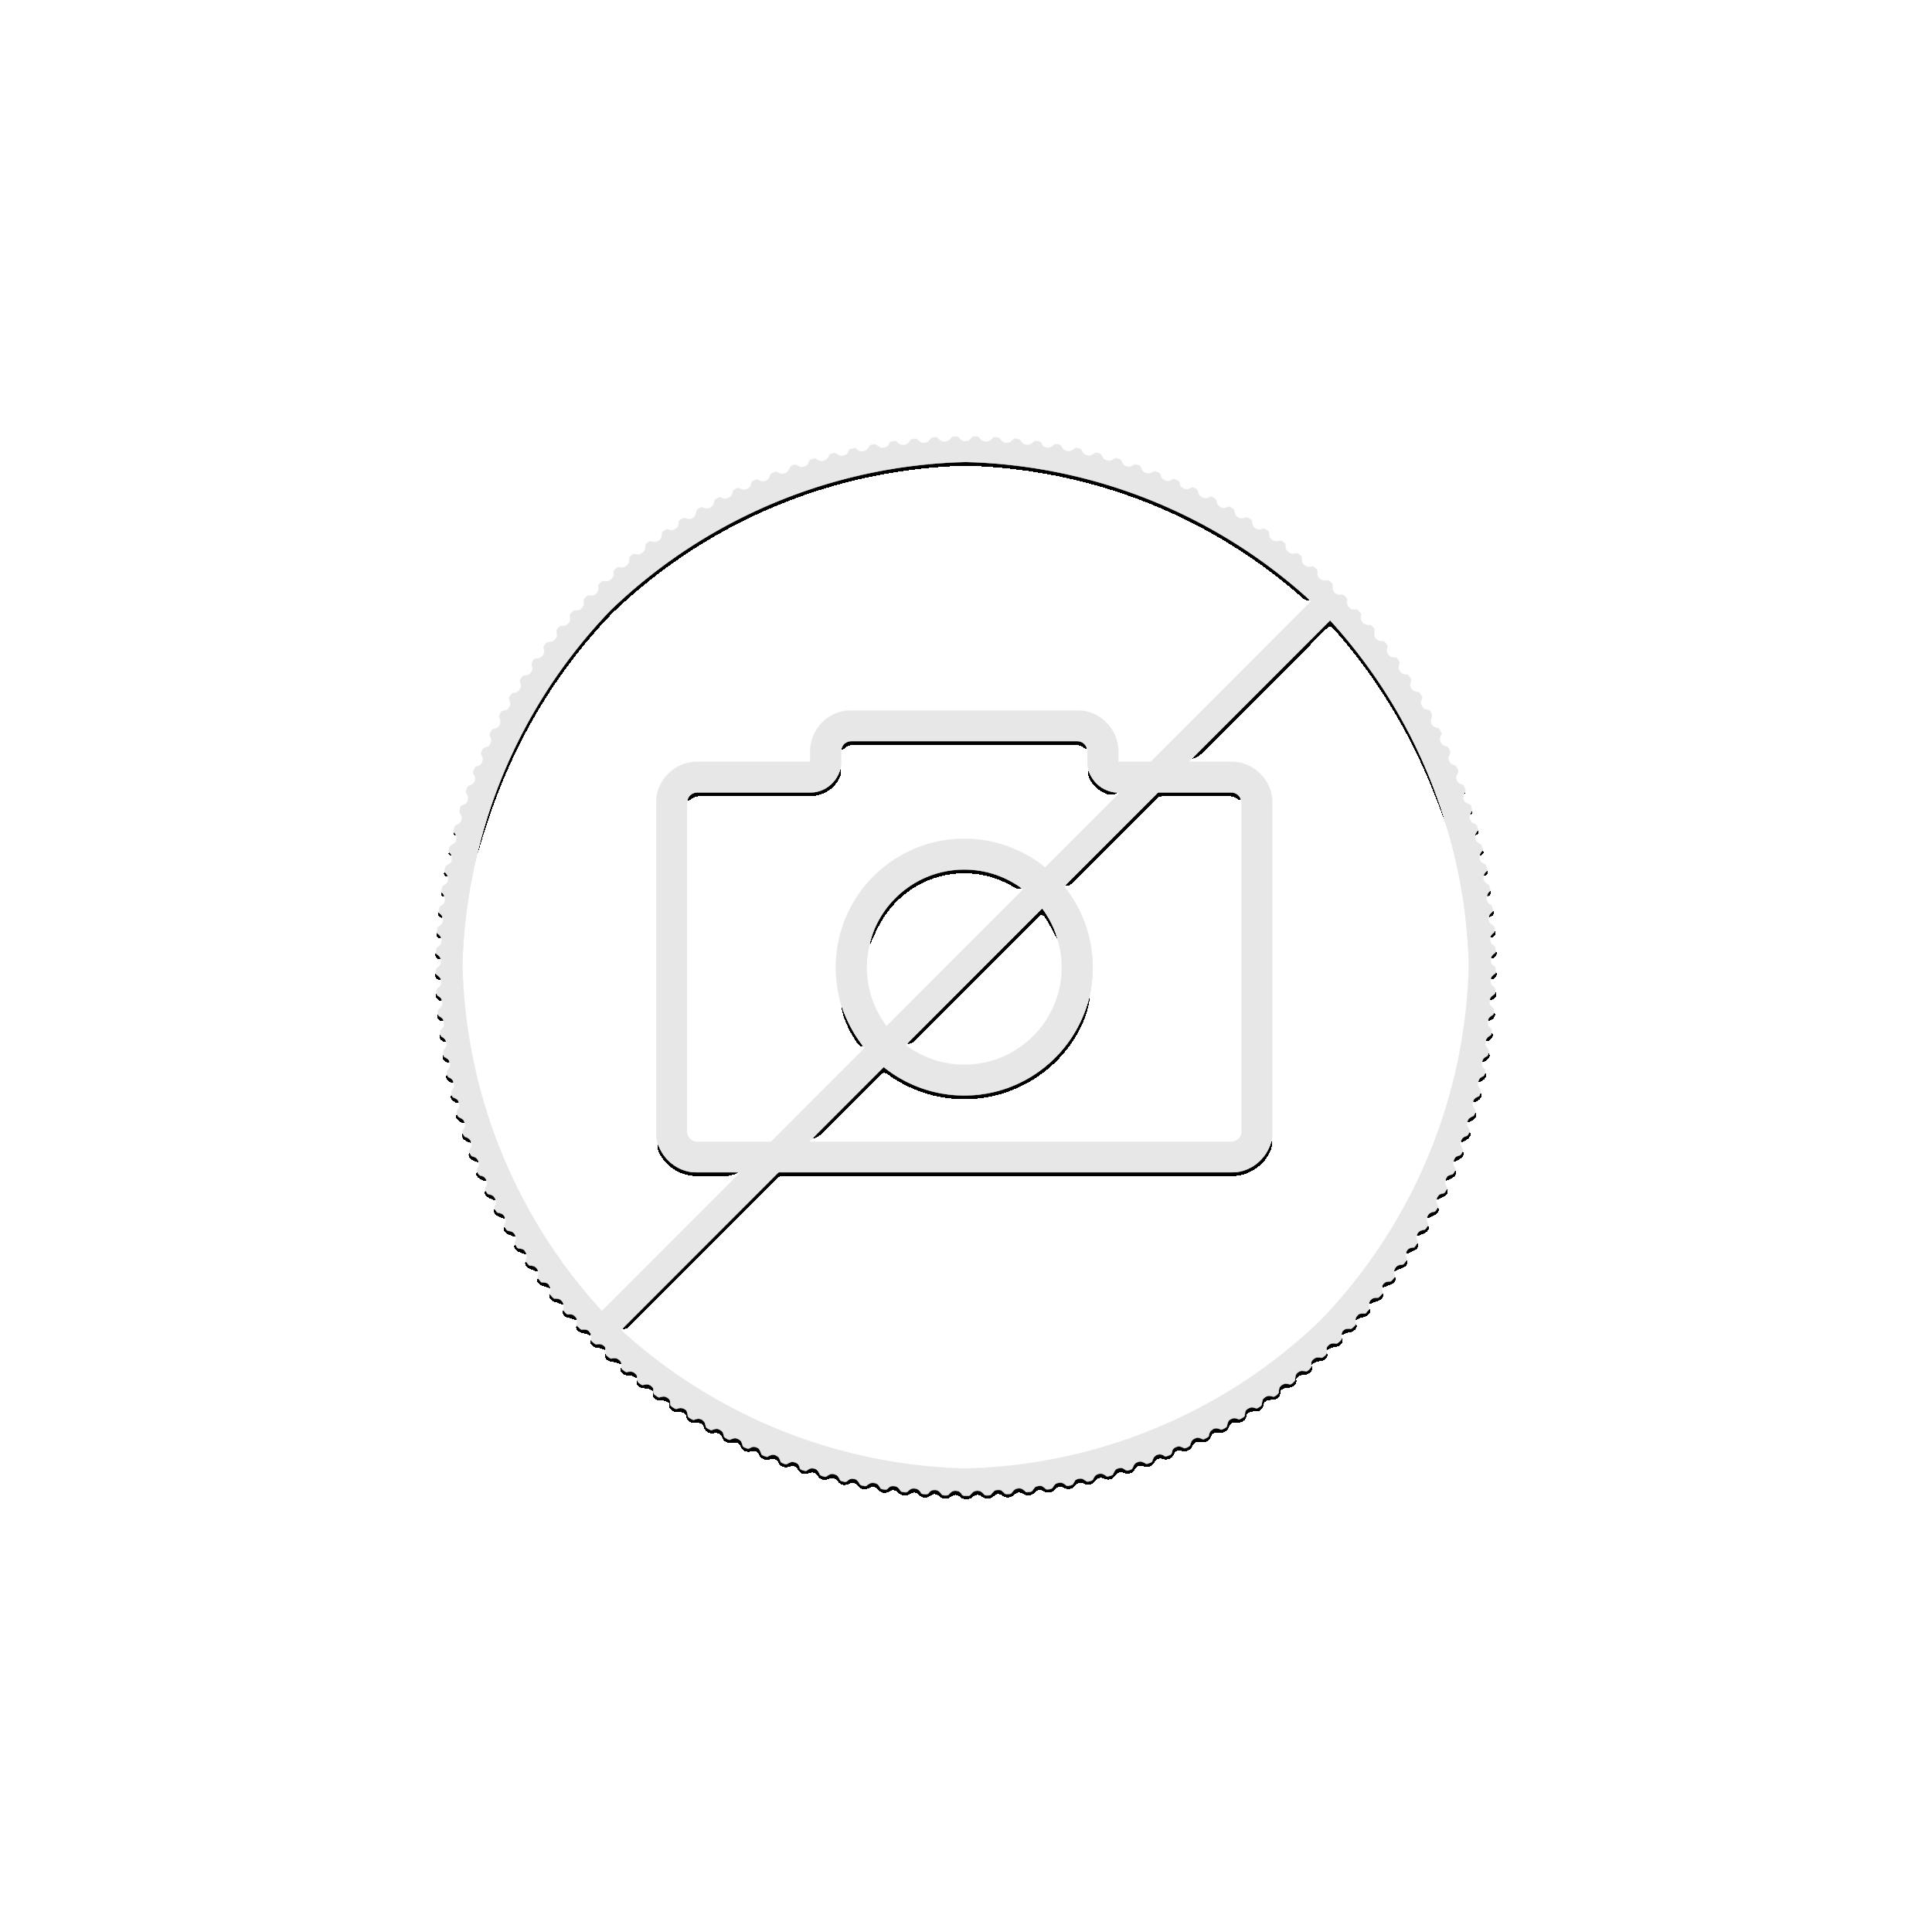 Gouden munt Duitse Mark 2001 achterzijde